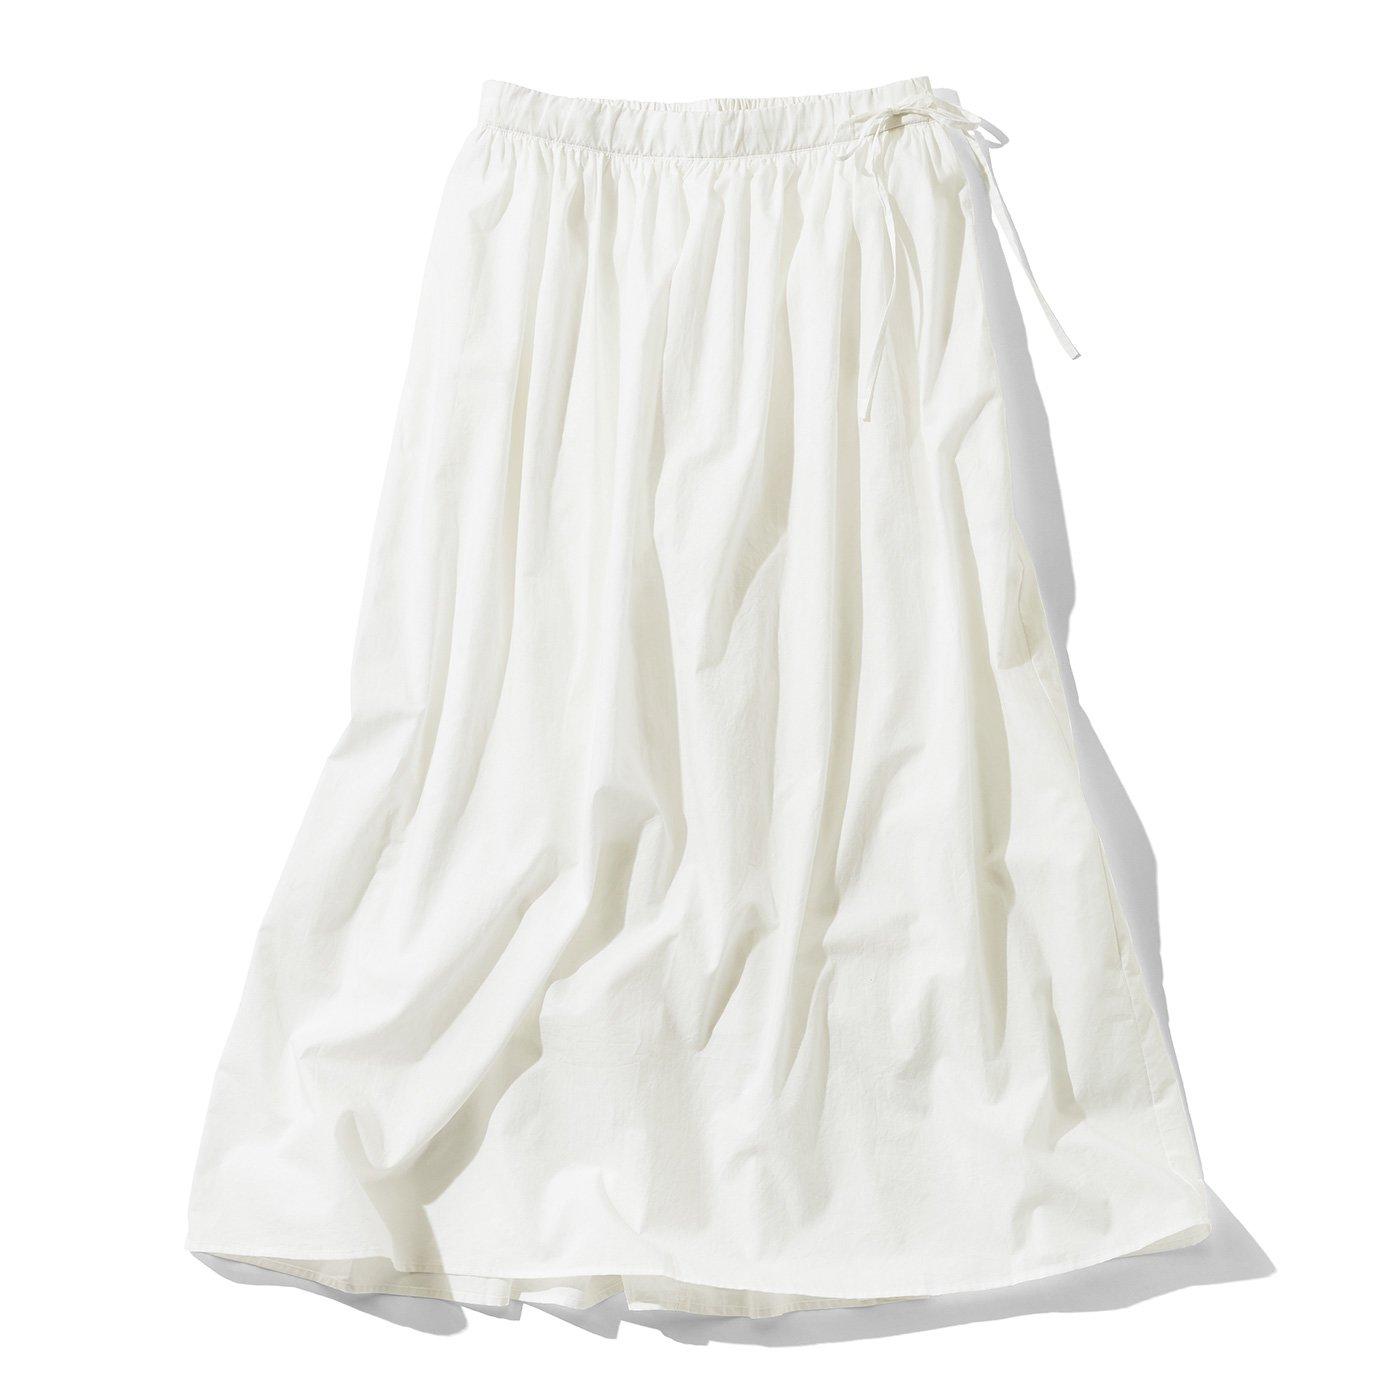 THREE FIFTY STANDARD 金子敦子さんと作った 真っ白なギャザースカート